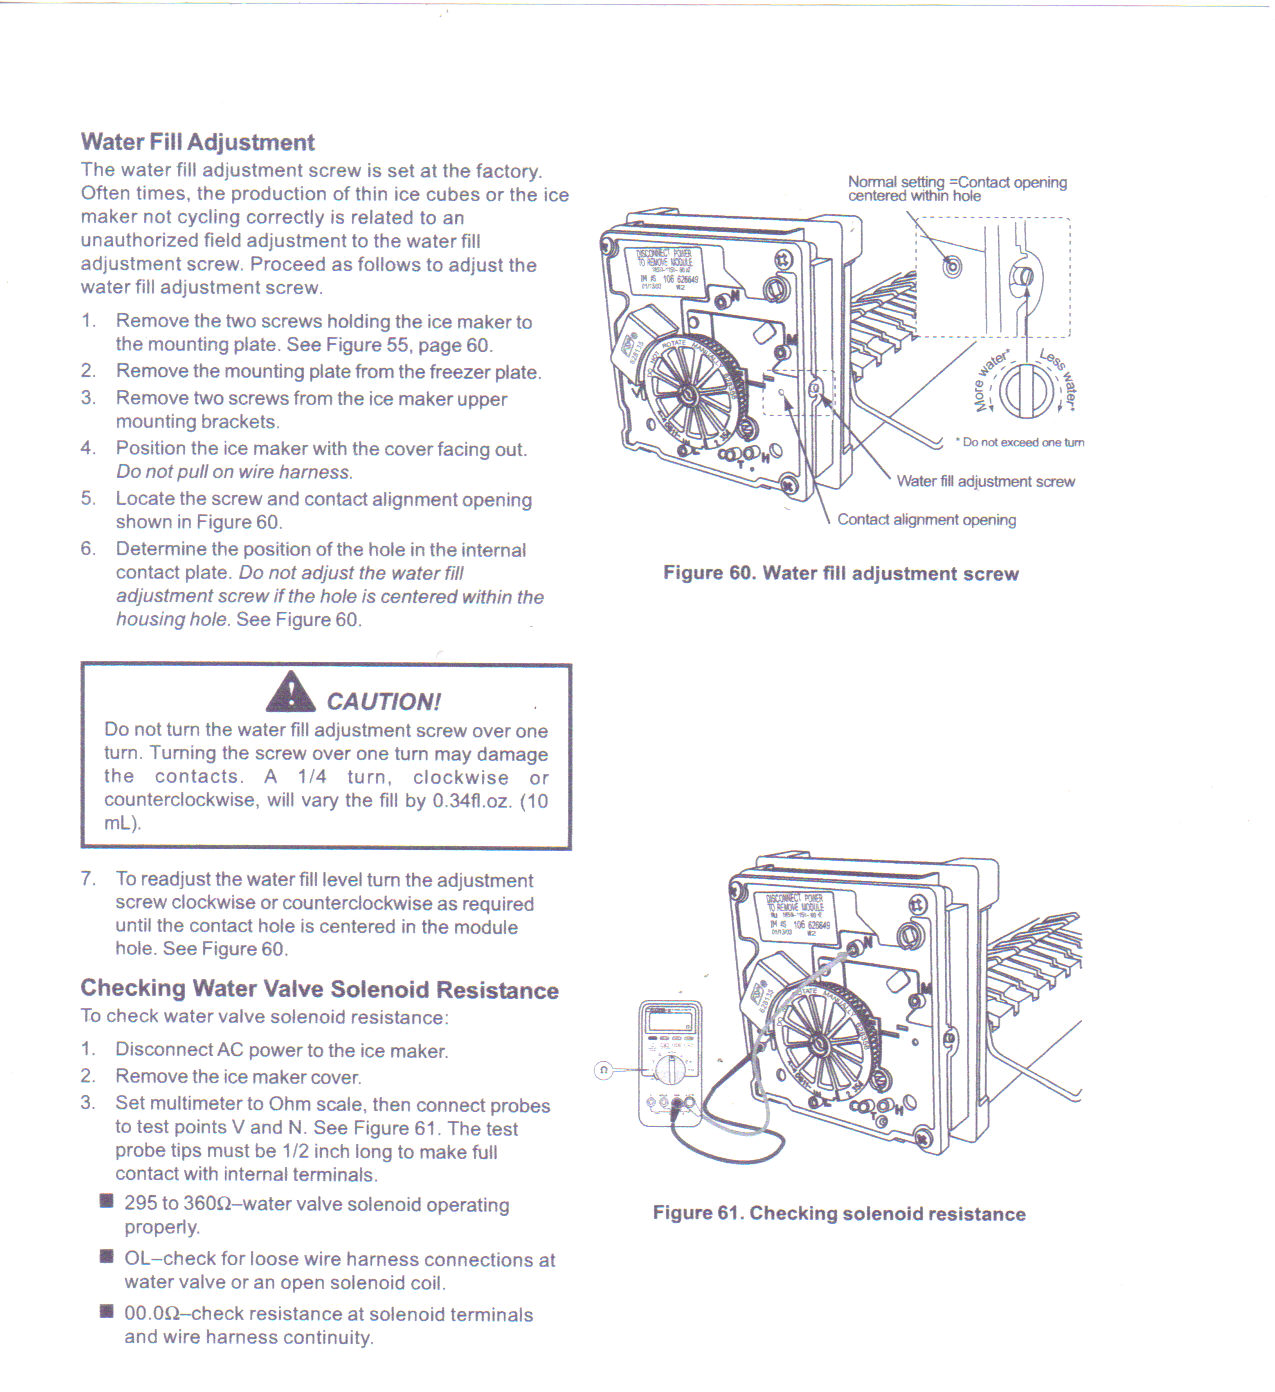 Wiring Diagram Norcold 1200lrim : Wiring diagram norcold lrim a amp service